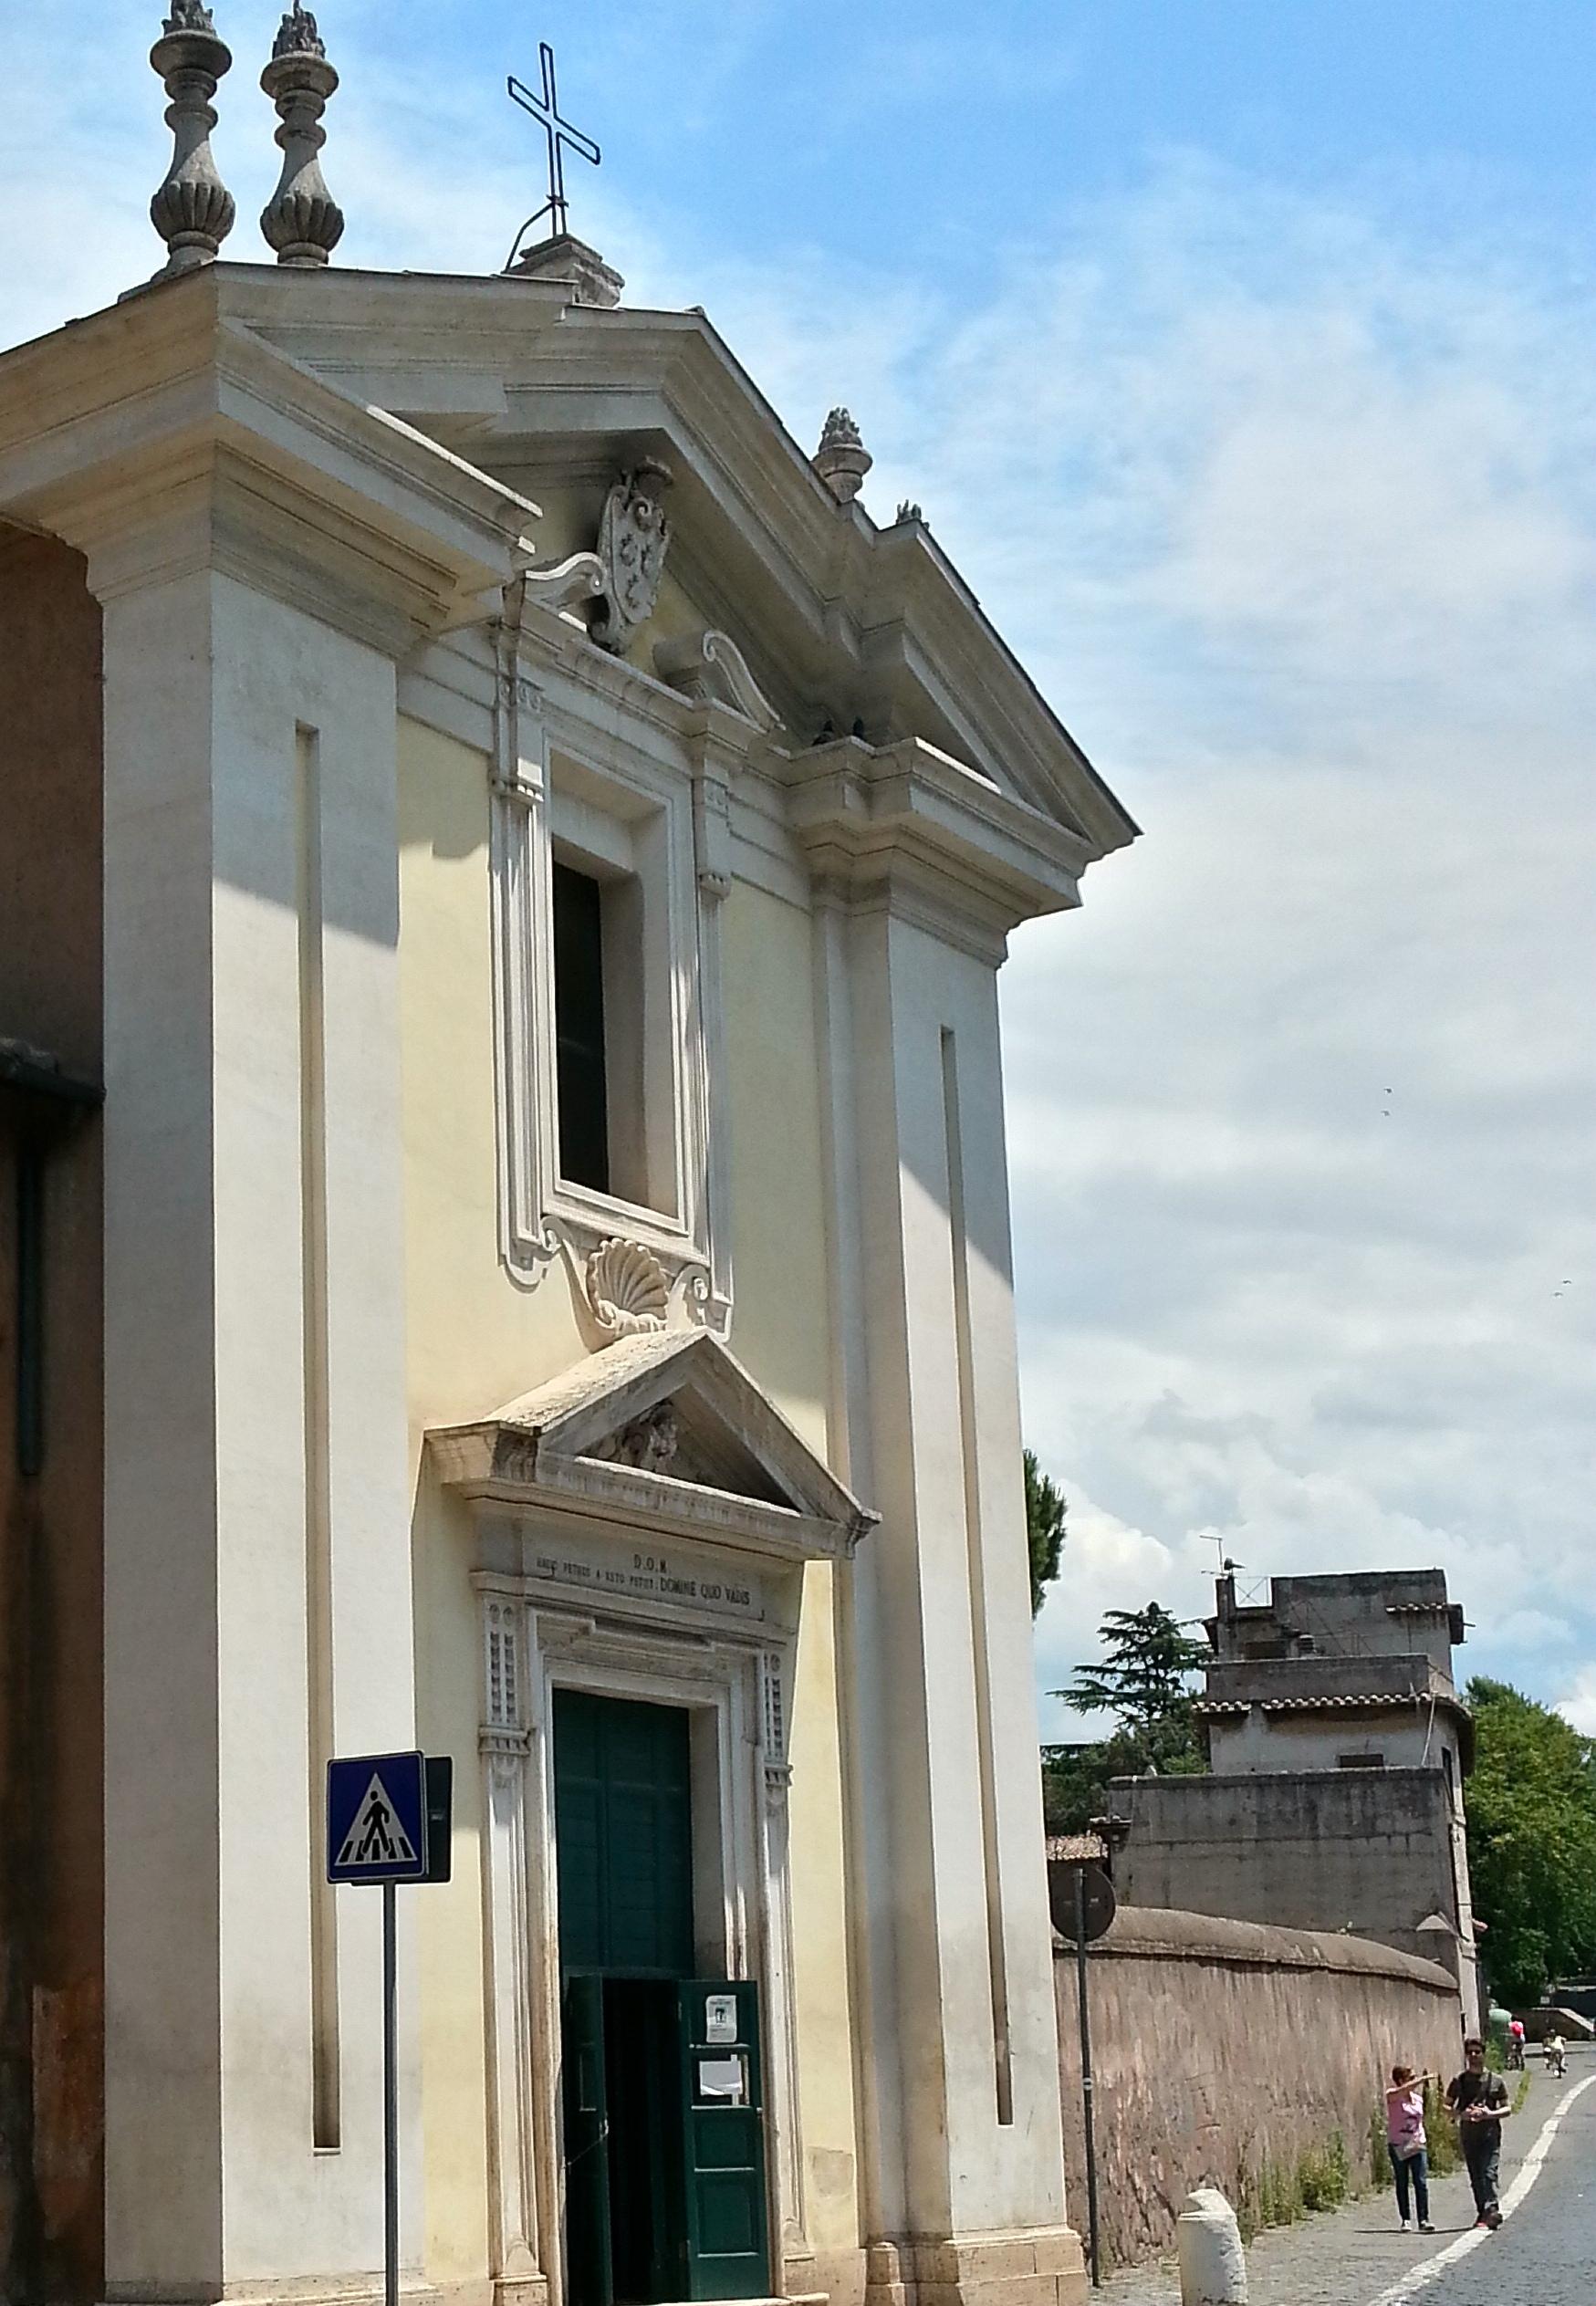 Santa Maria in Palmis